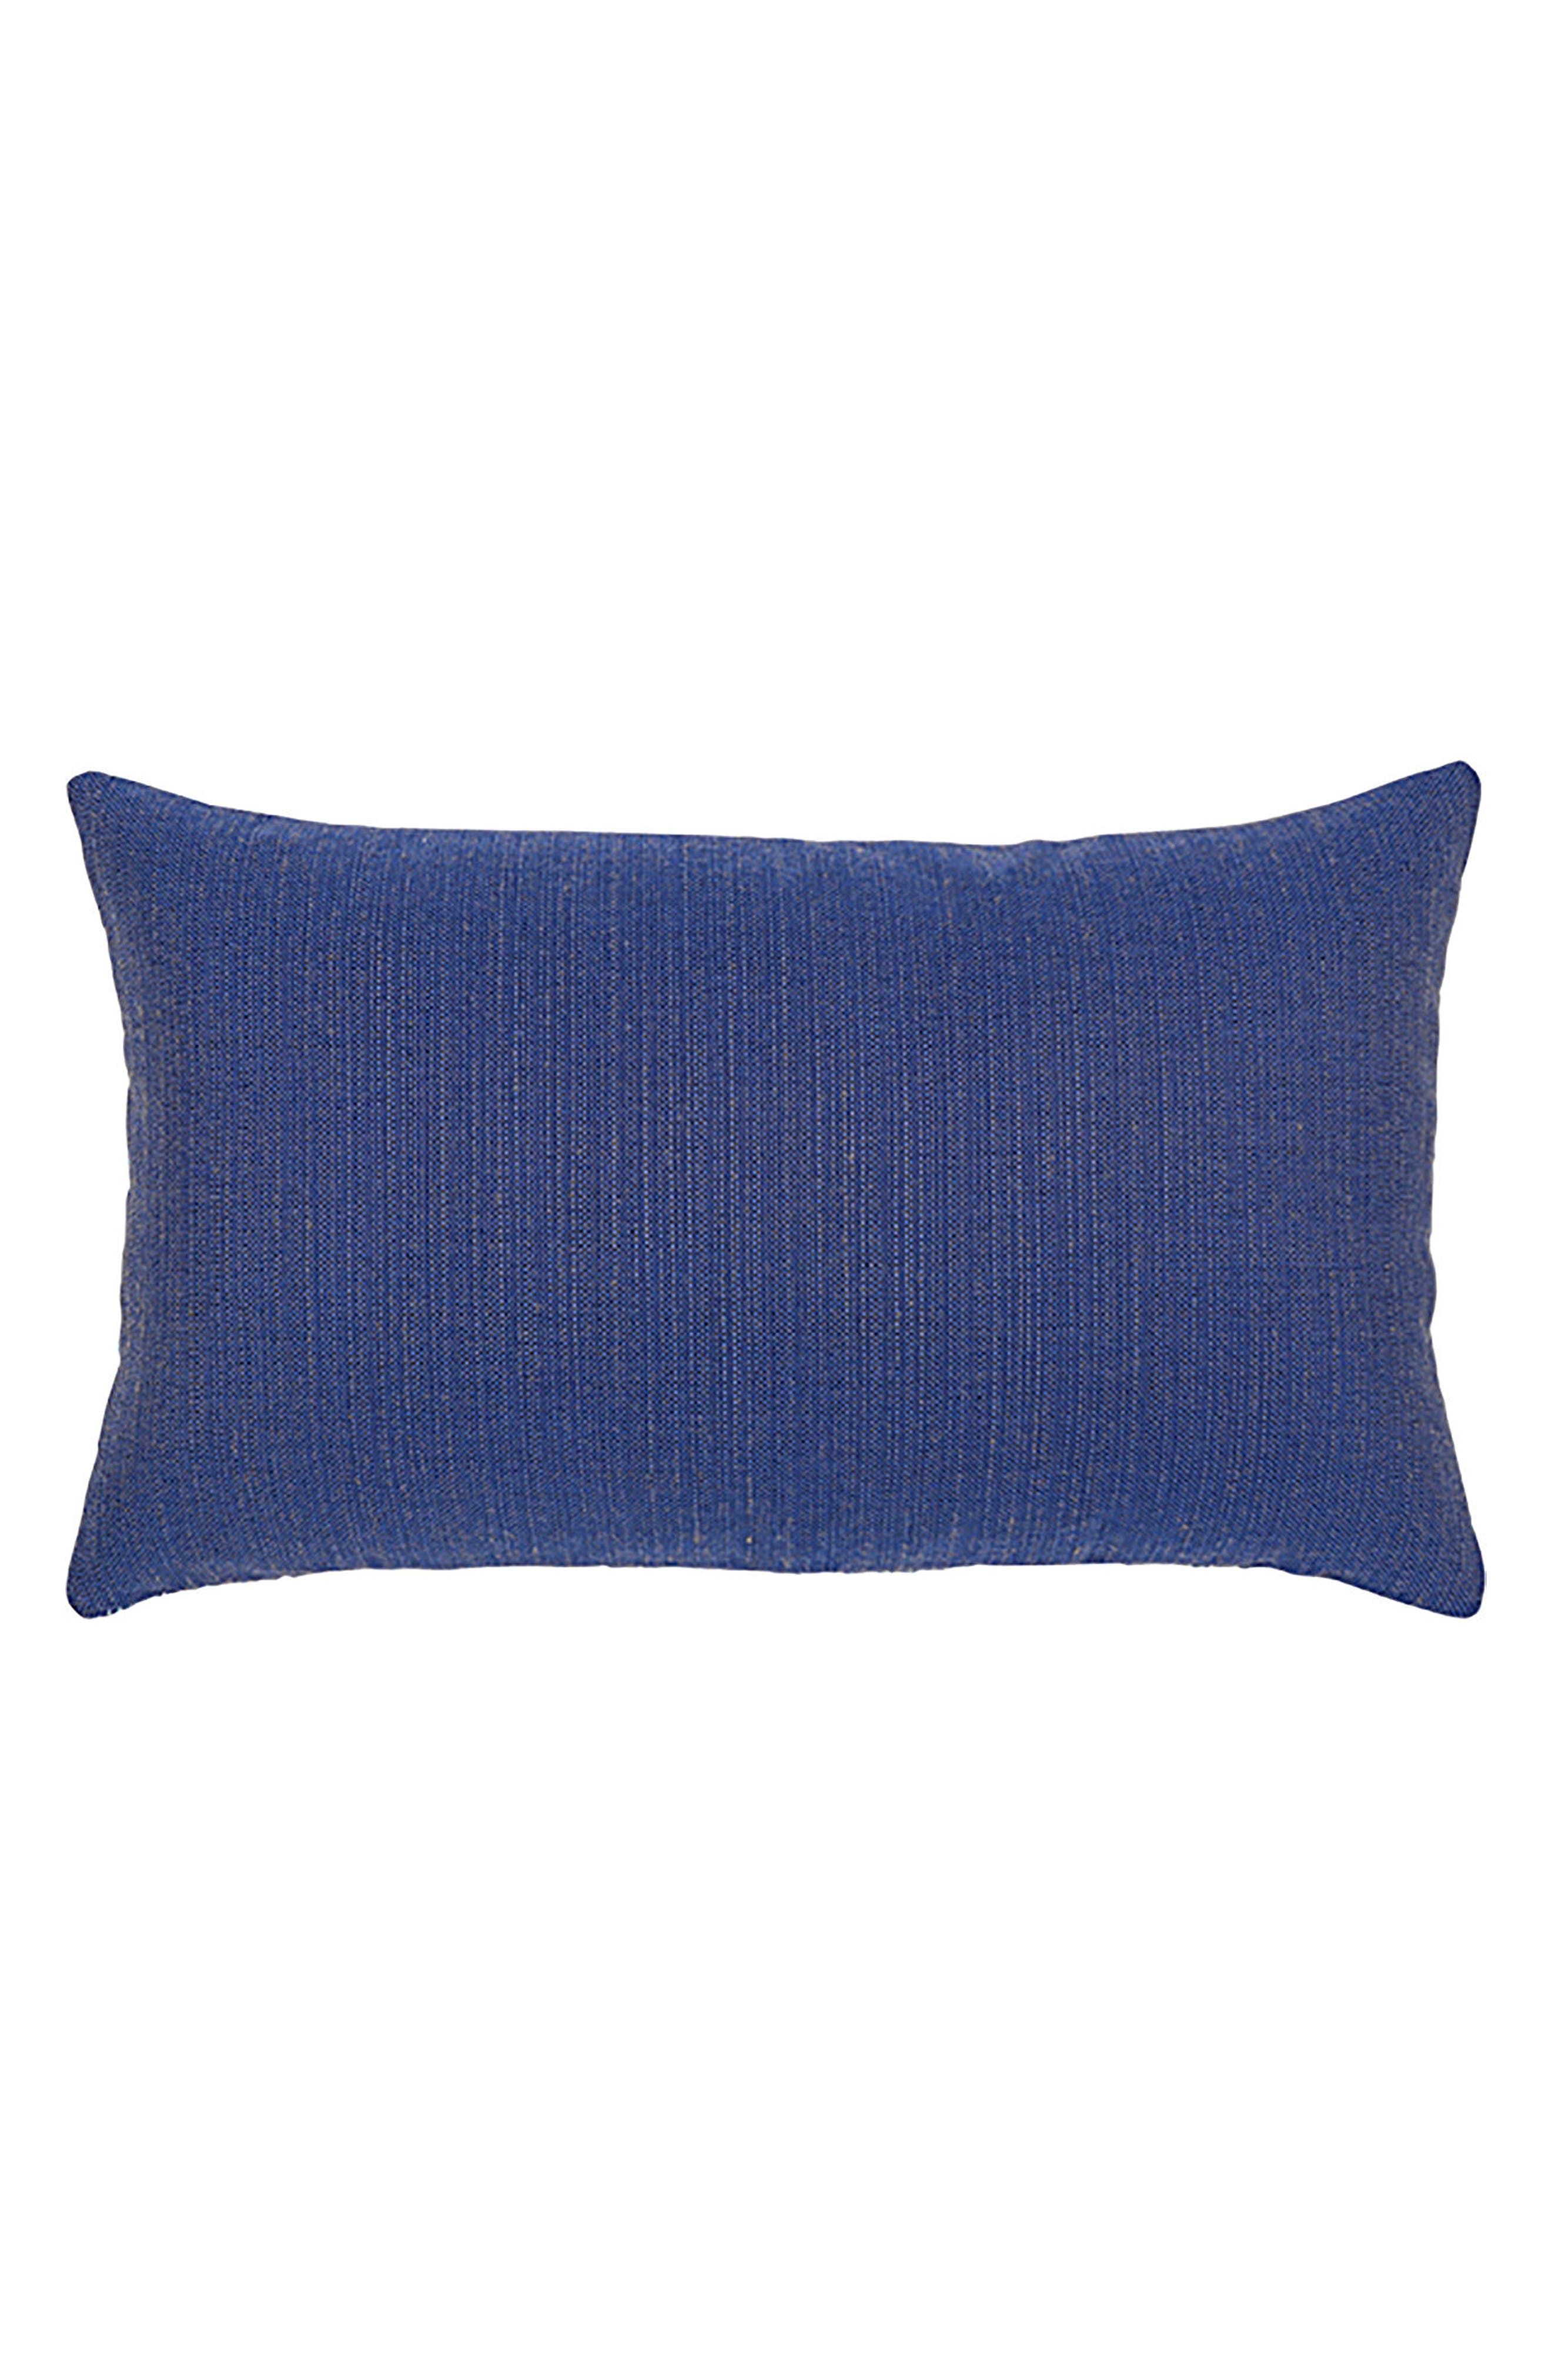 Midnight Tile Lumbar Pillow,                             Alternate thumbnail 3, color,                             Blue